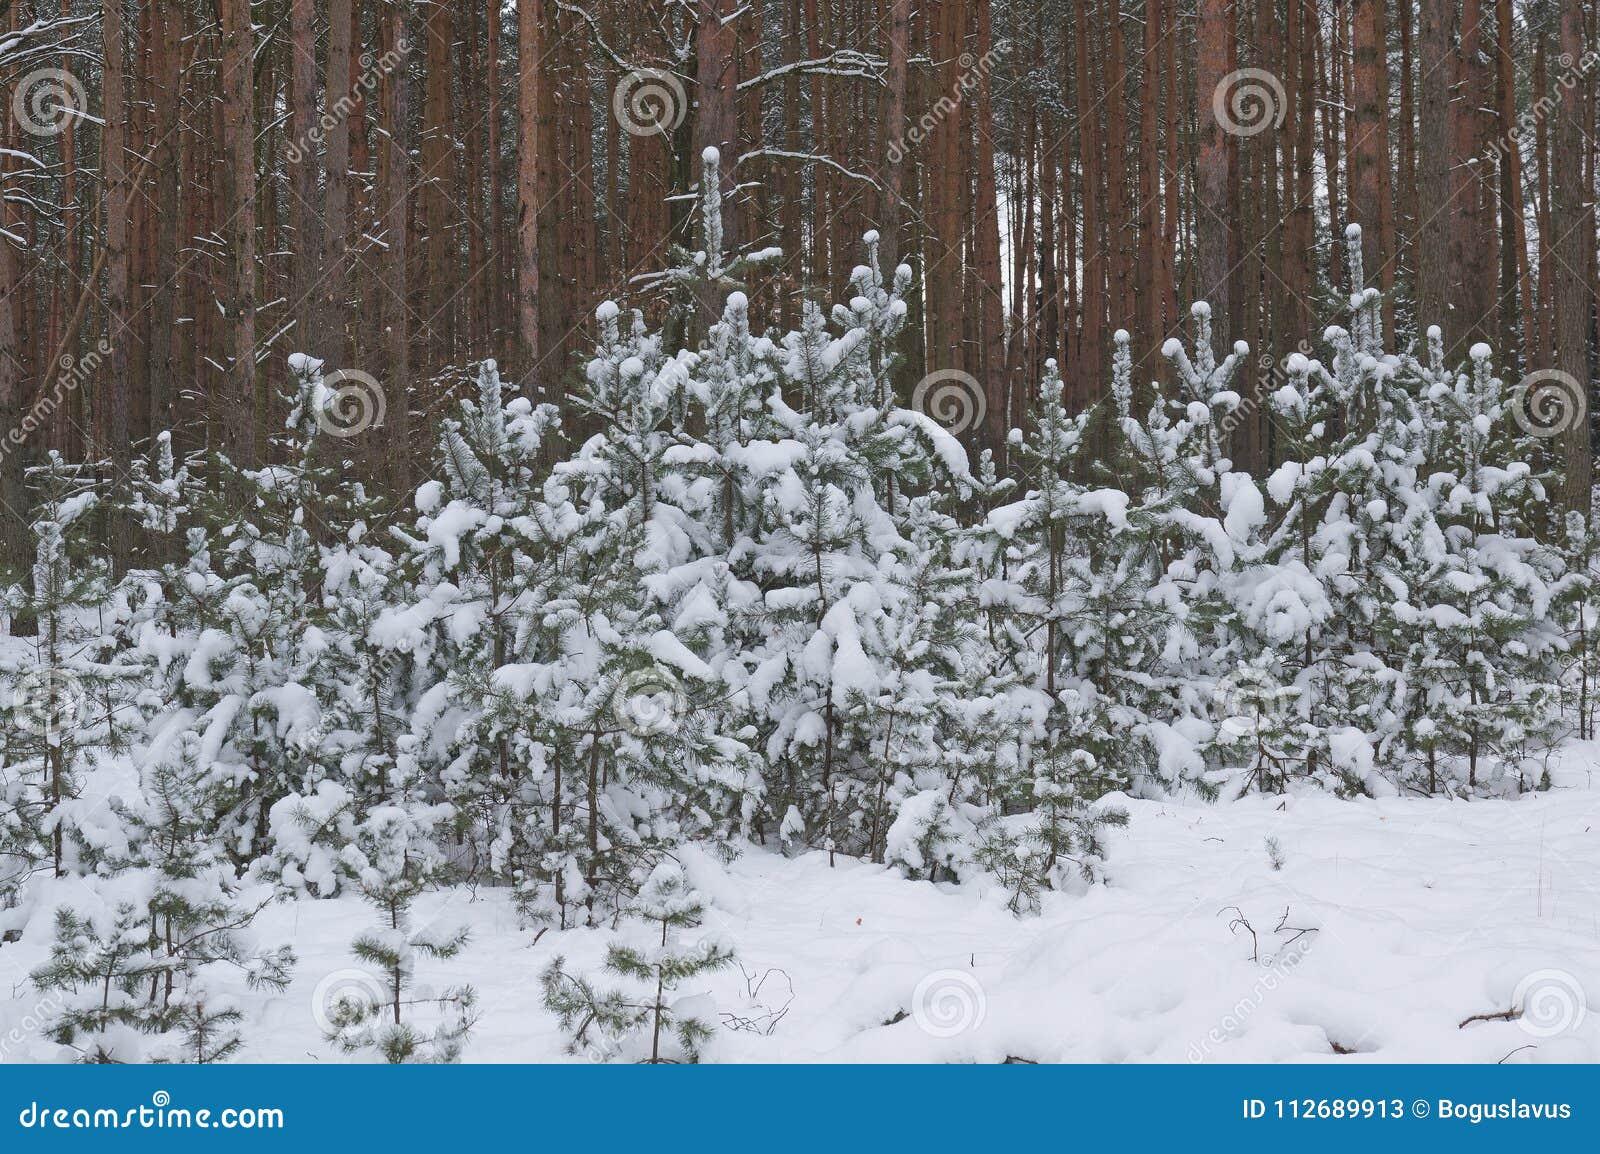 Small pines pics